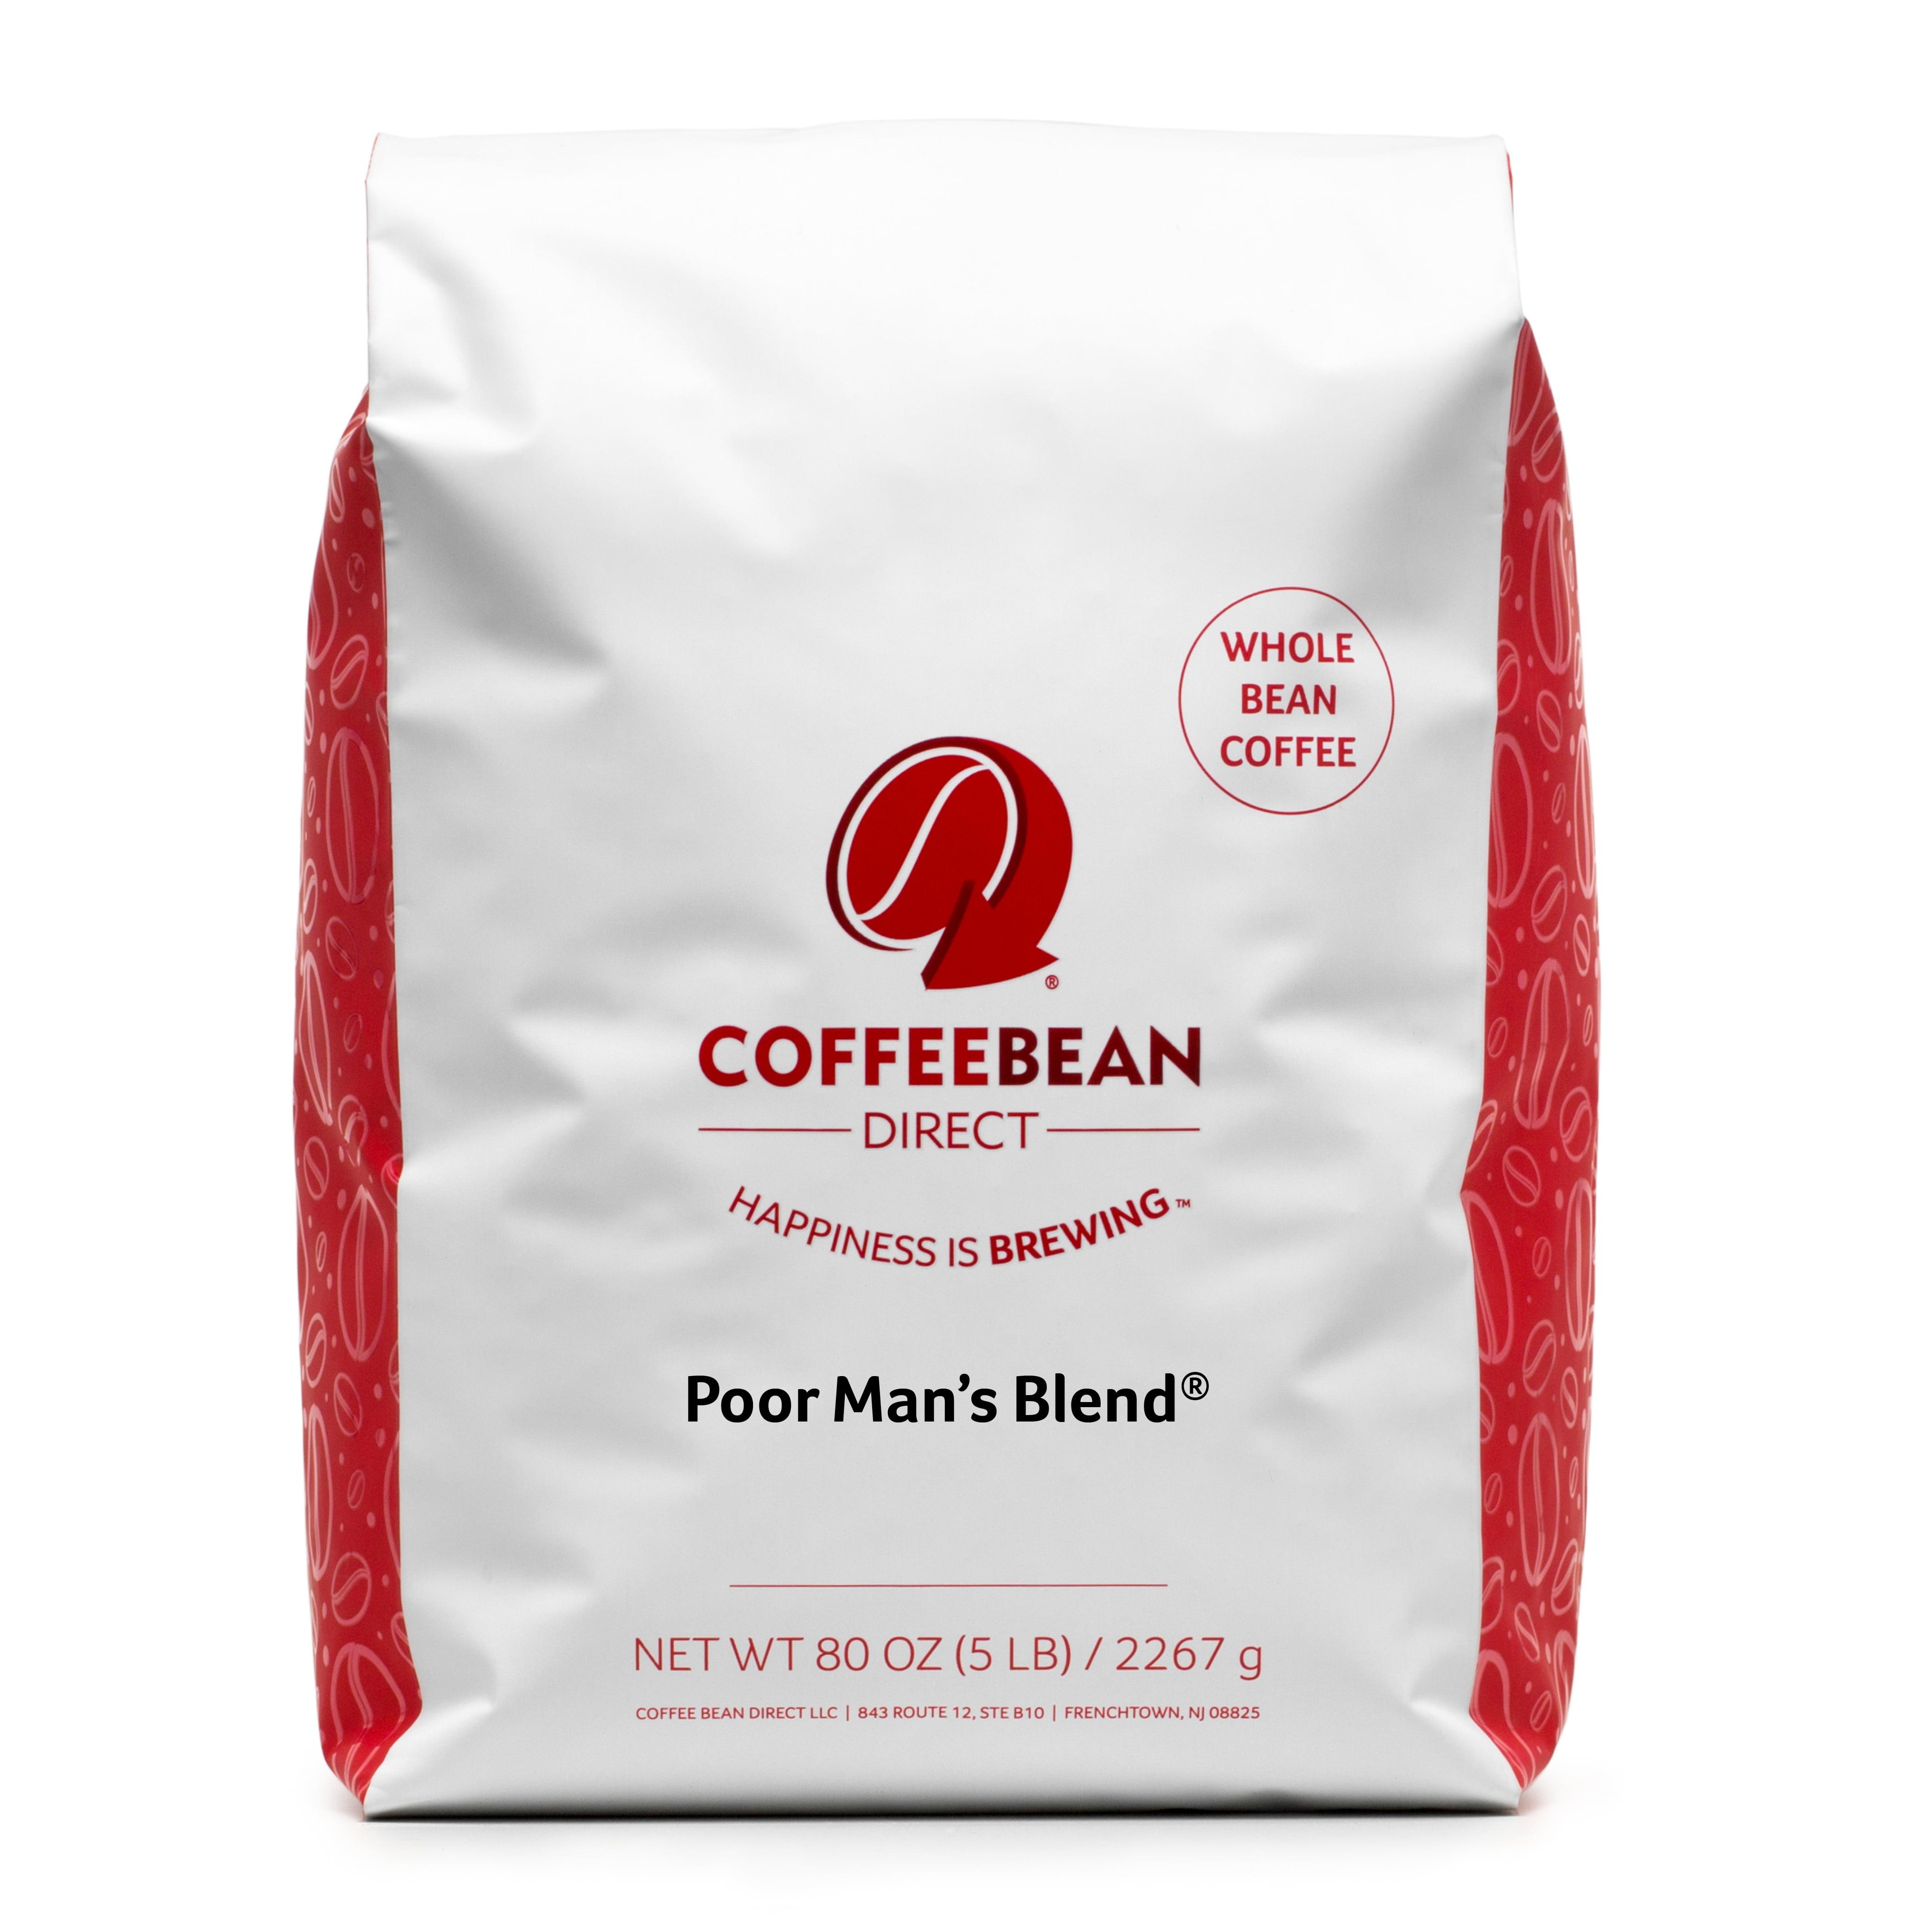 Coffee Bean Direct Whole Bean Coffee, Poor Man's Blend, 80 Oz